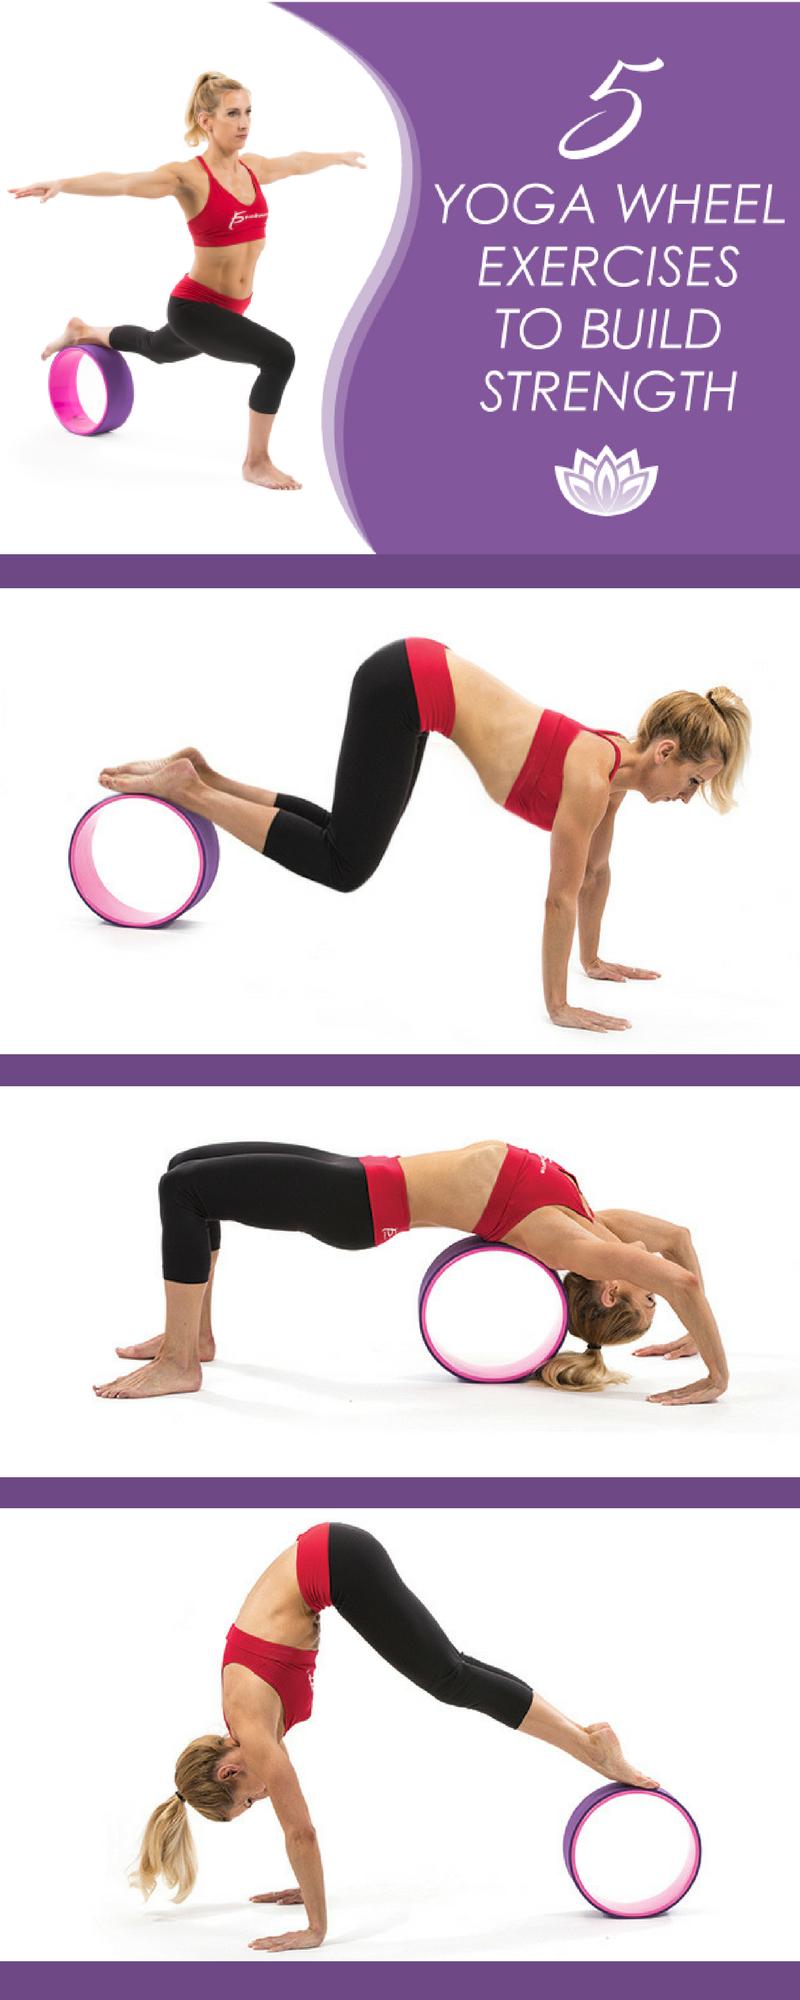 5 Yoga Wheel Exercises to Build Strength